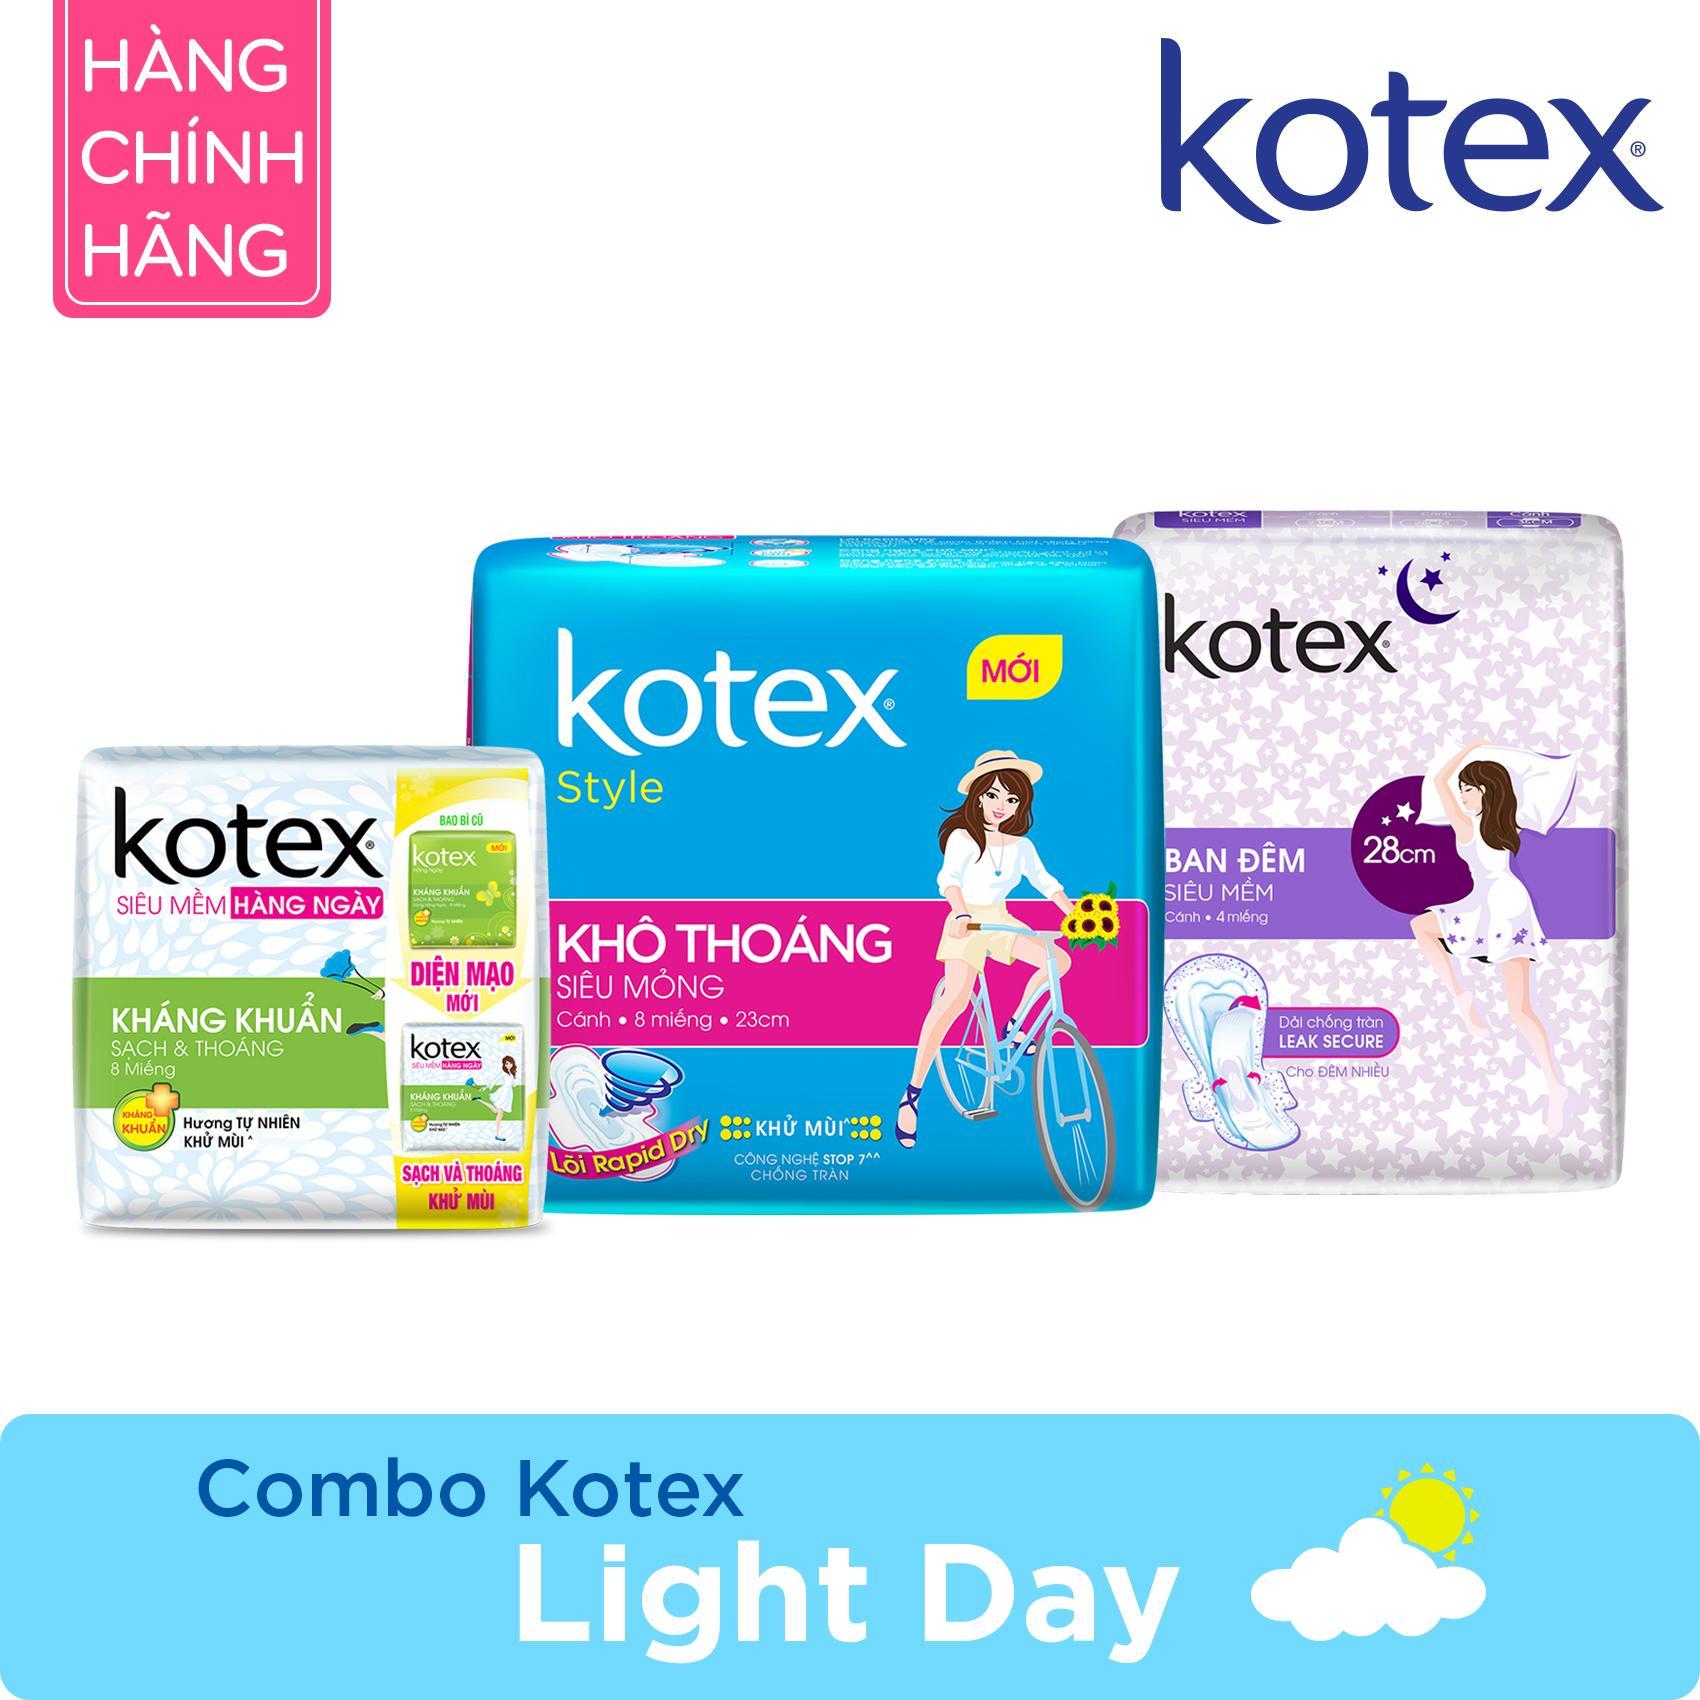 Combo Kotex Light Day